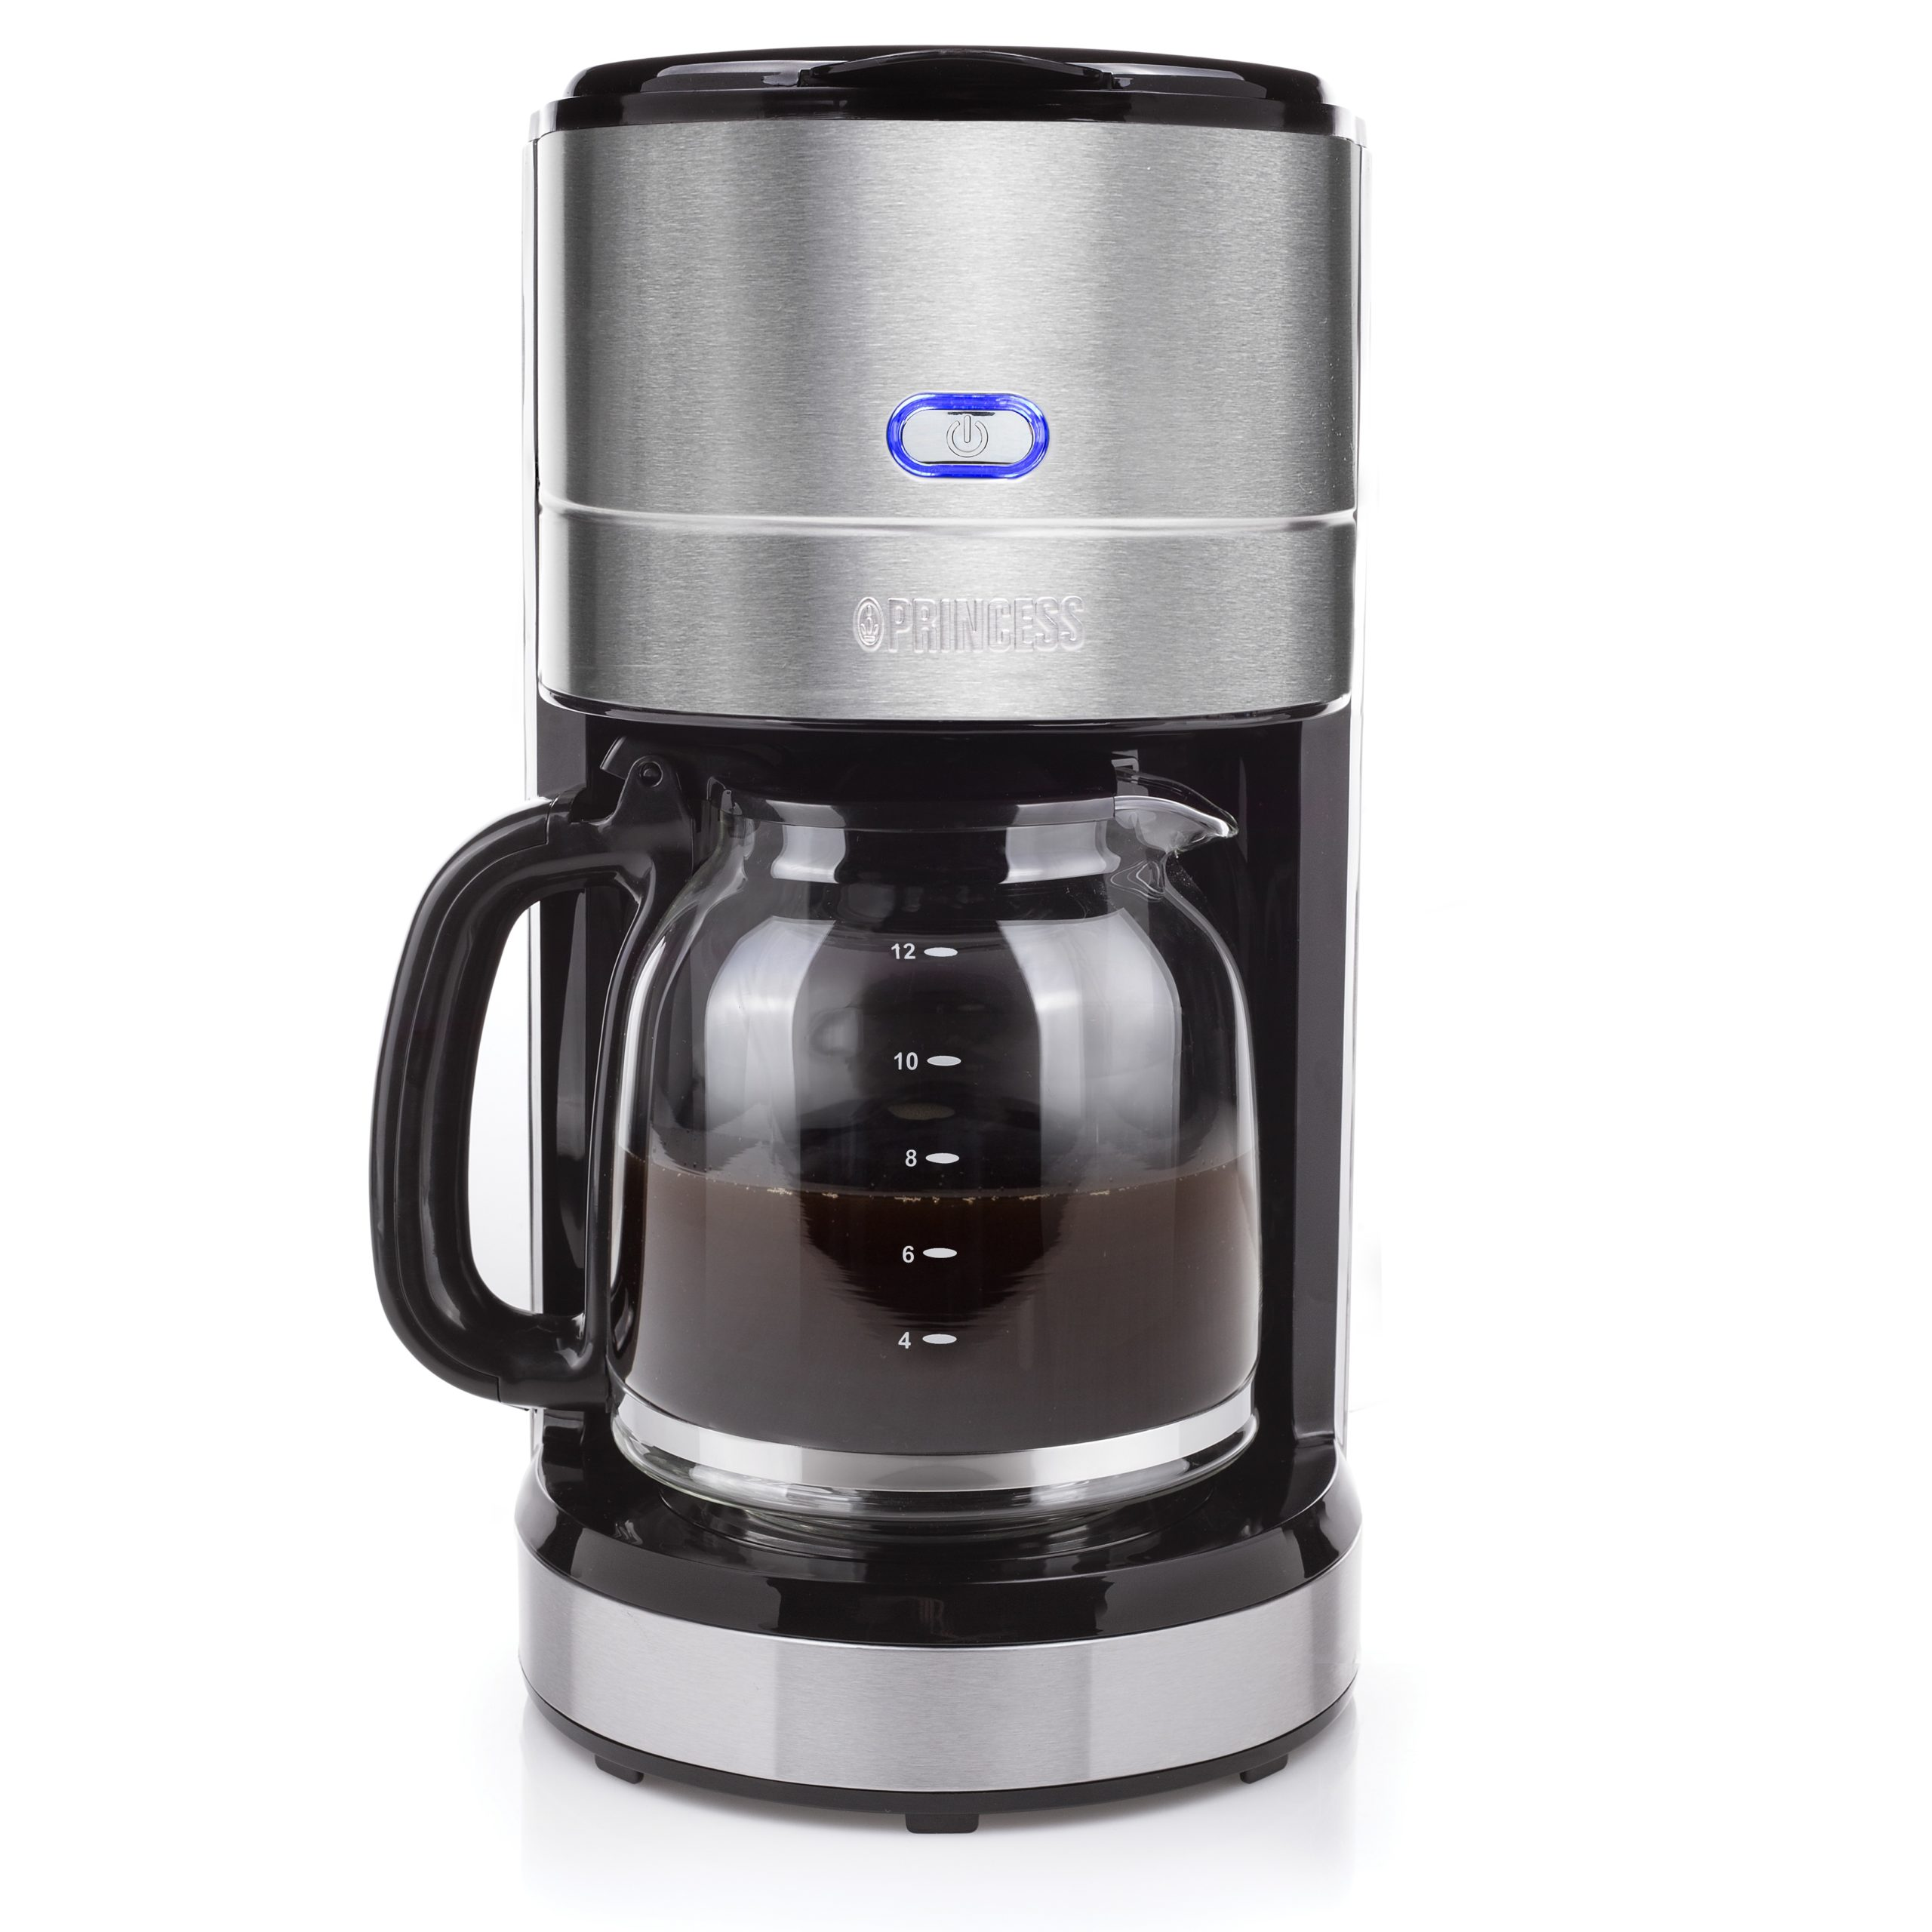 Princess 246001 Coffee Maker